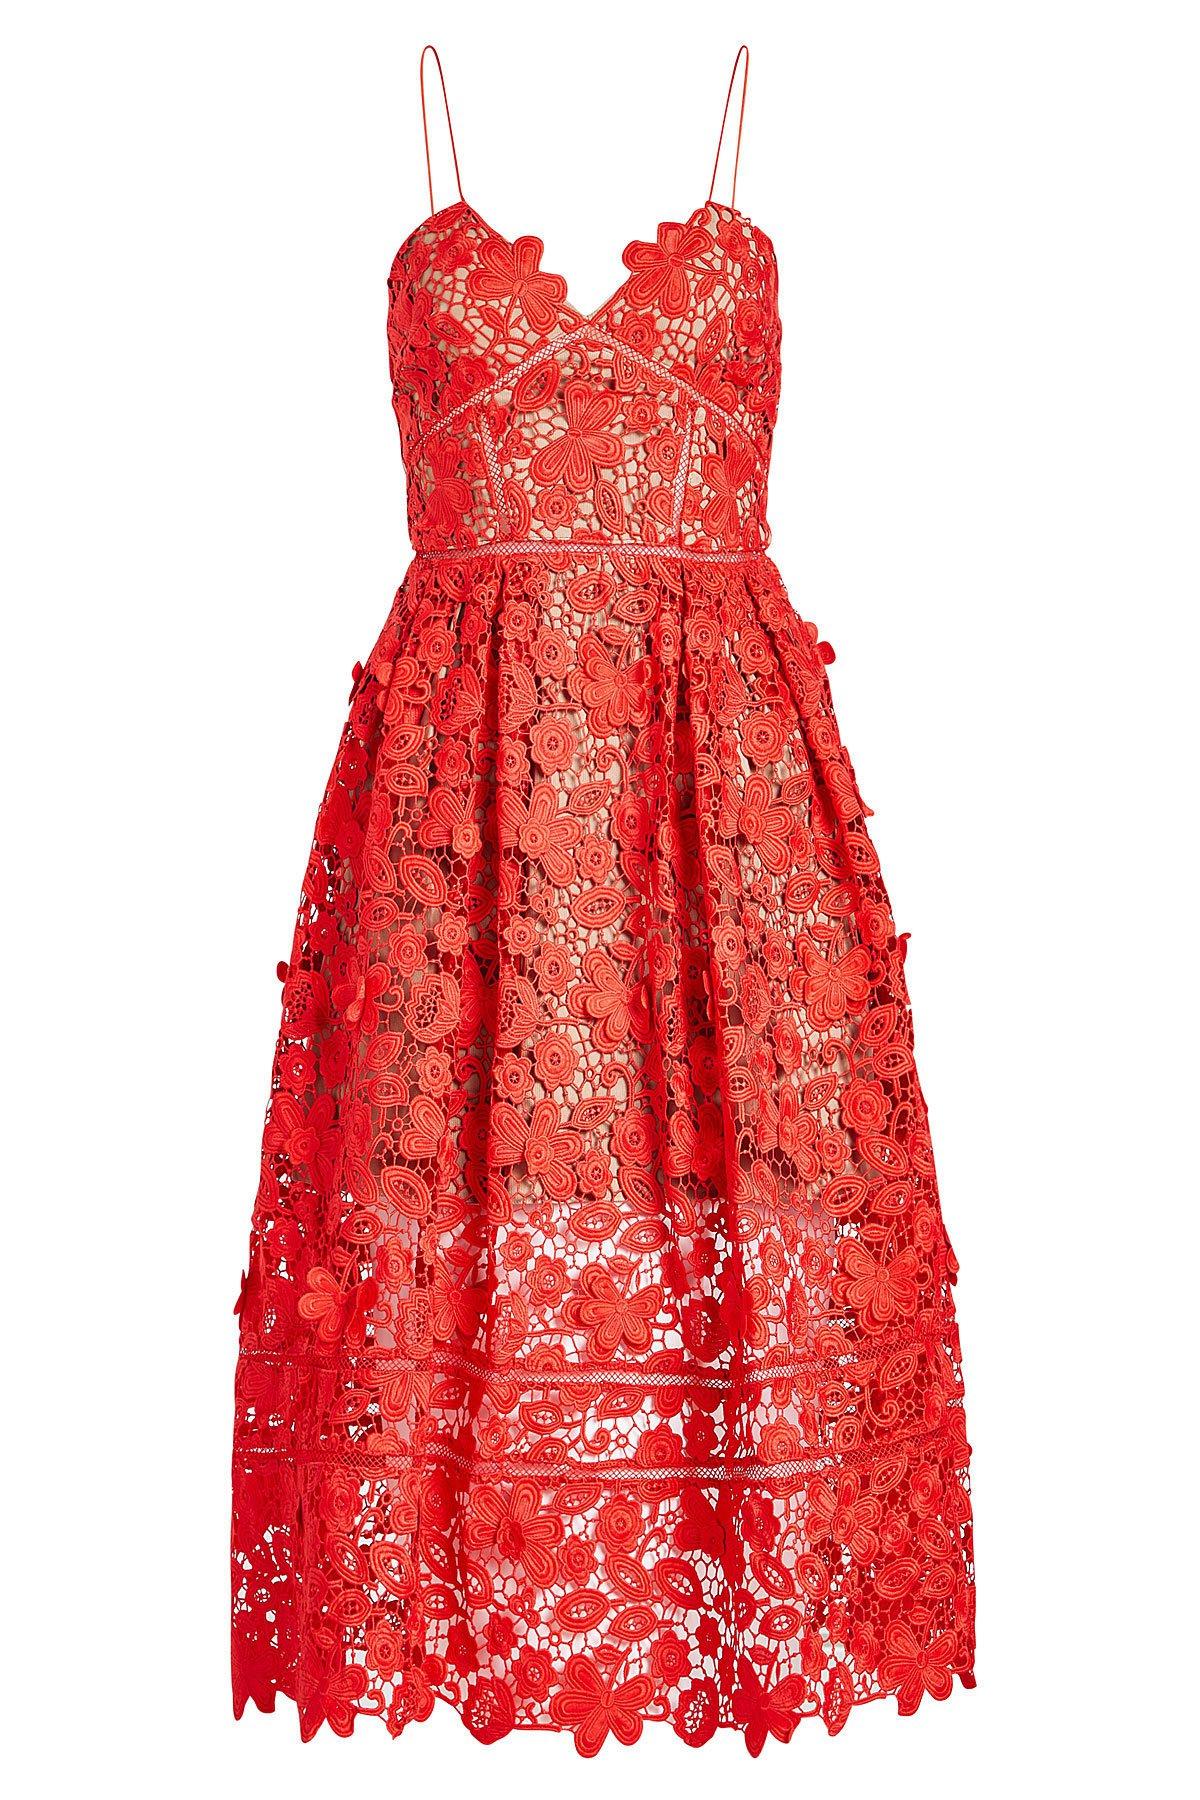 Azaelea 3D Lace Fit & Flare Dress Gr. UK 4